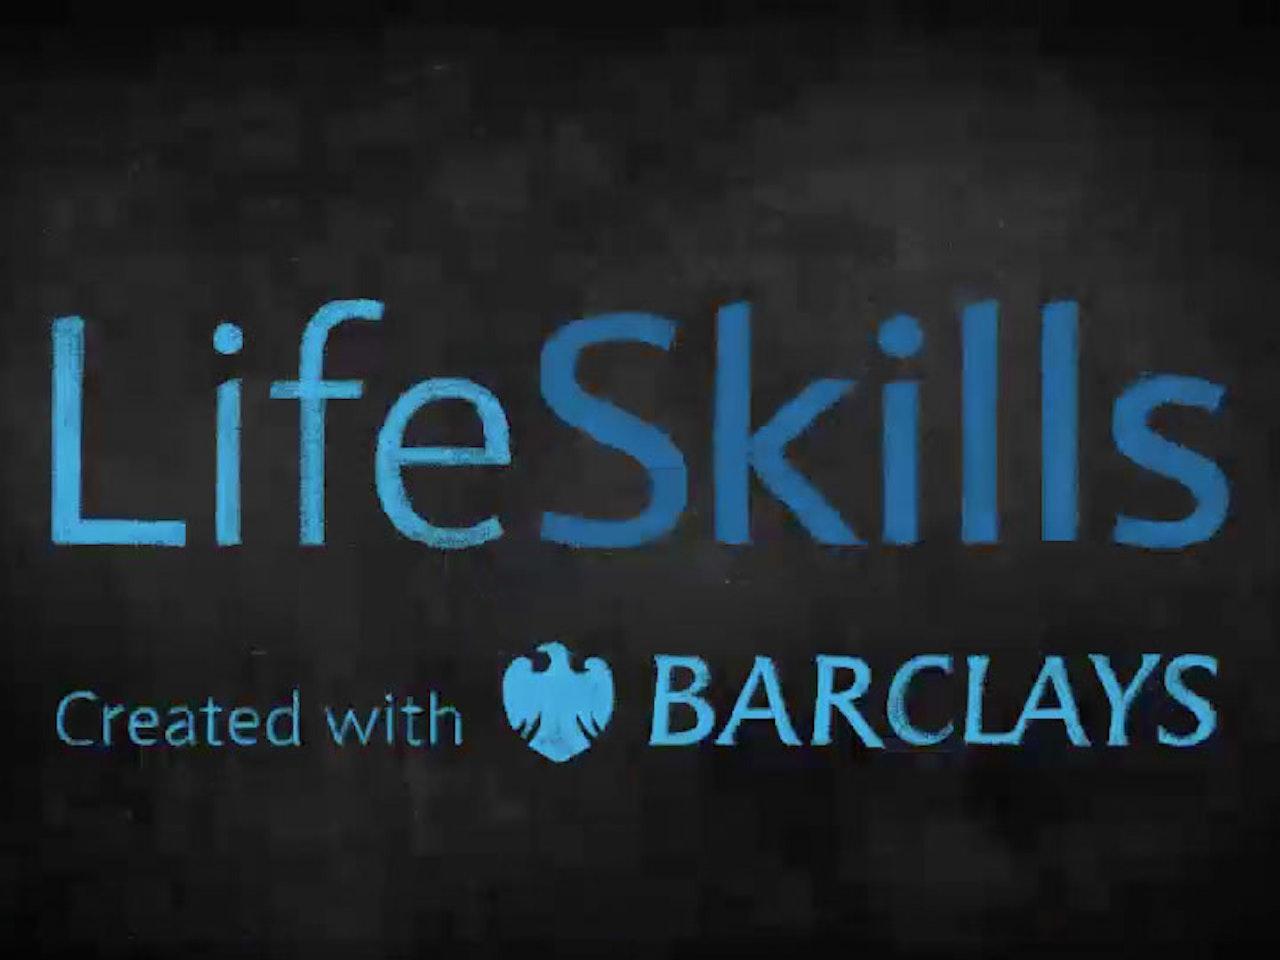 Barclays LifeSkills -